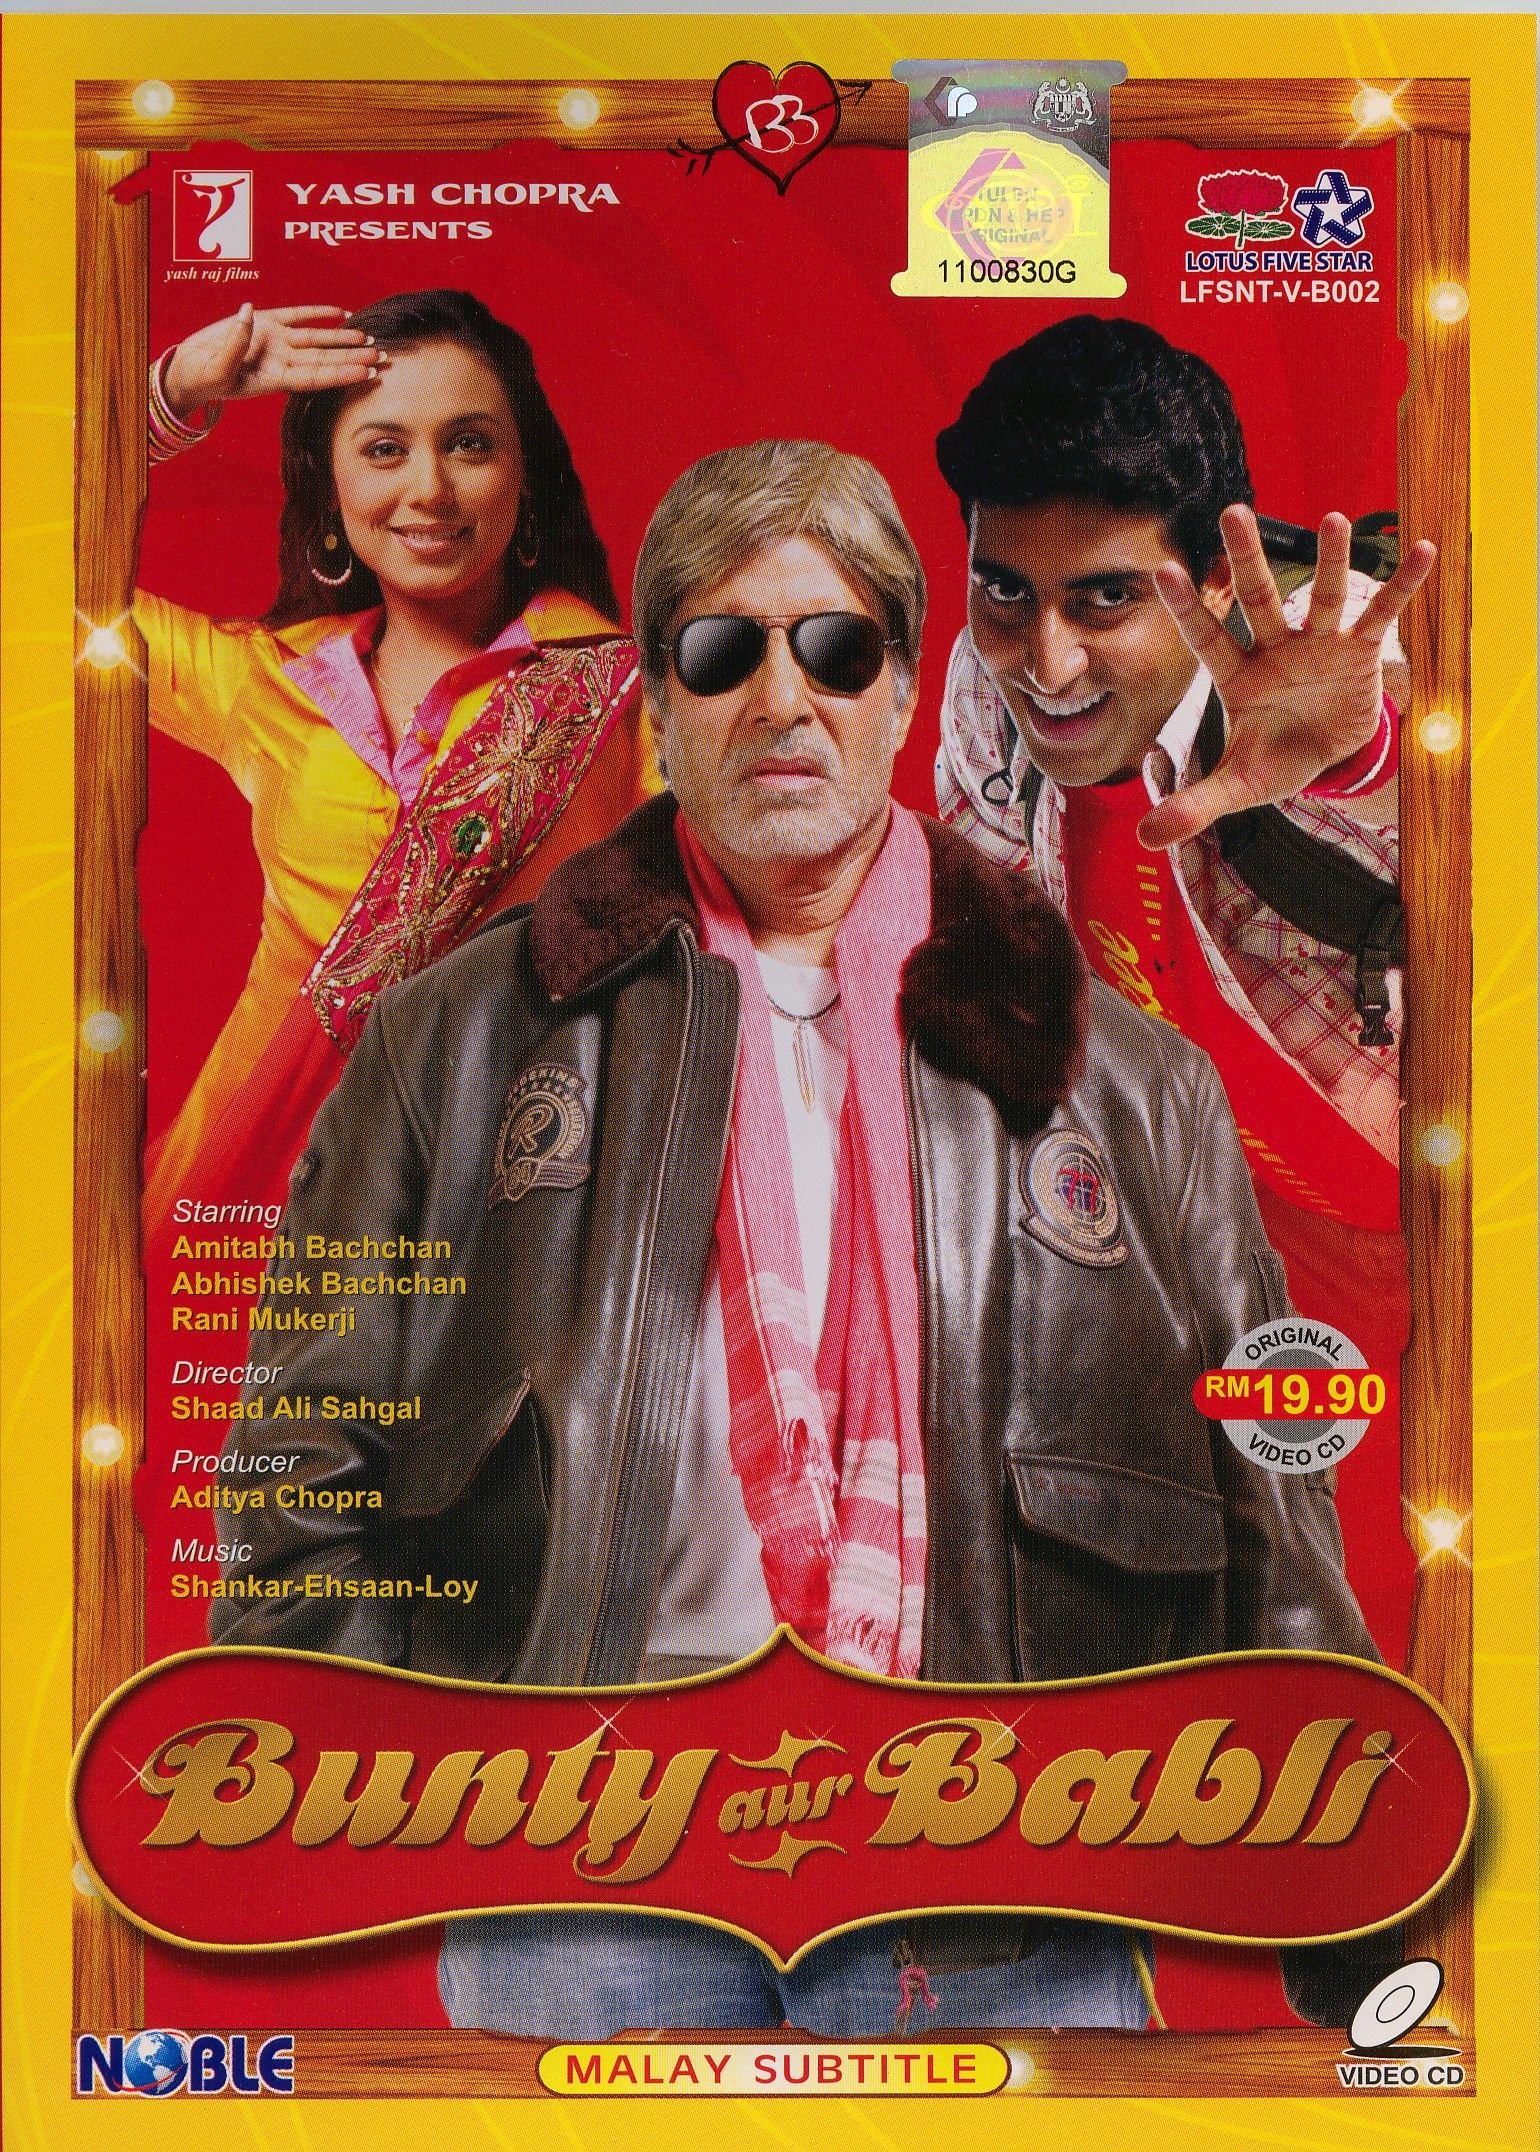 Bunty Aur Babli 2005 | Desi movies | Pinterest | Bollywood ...